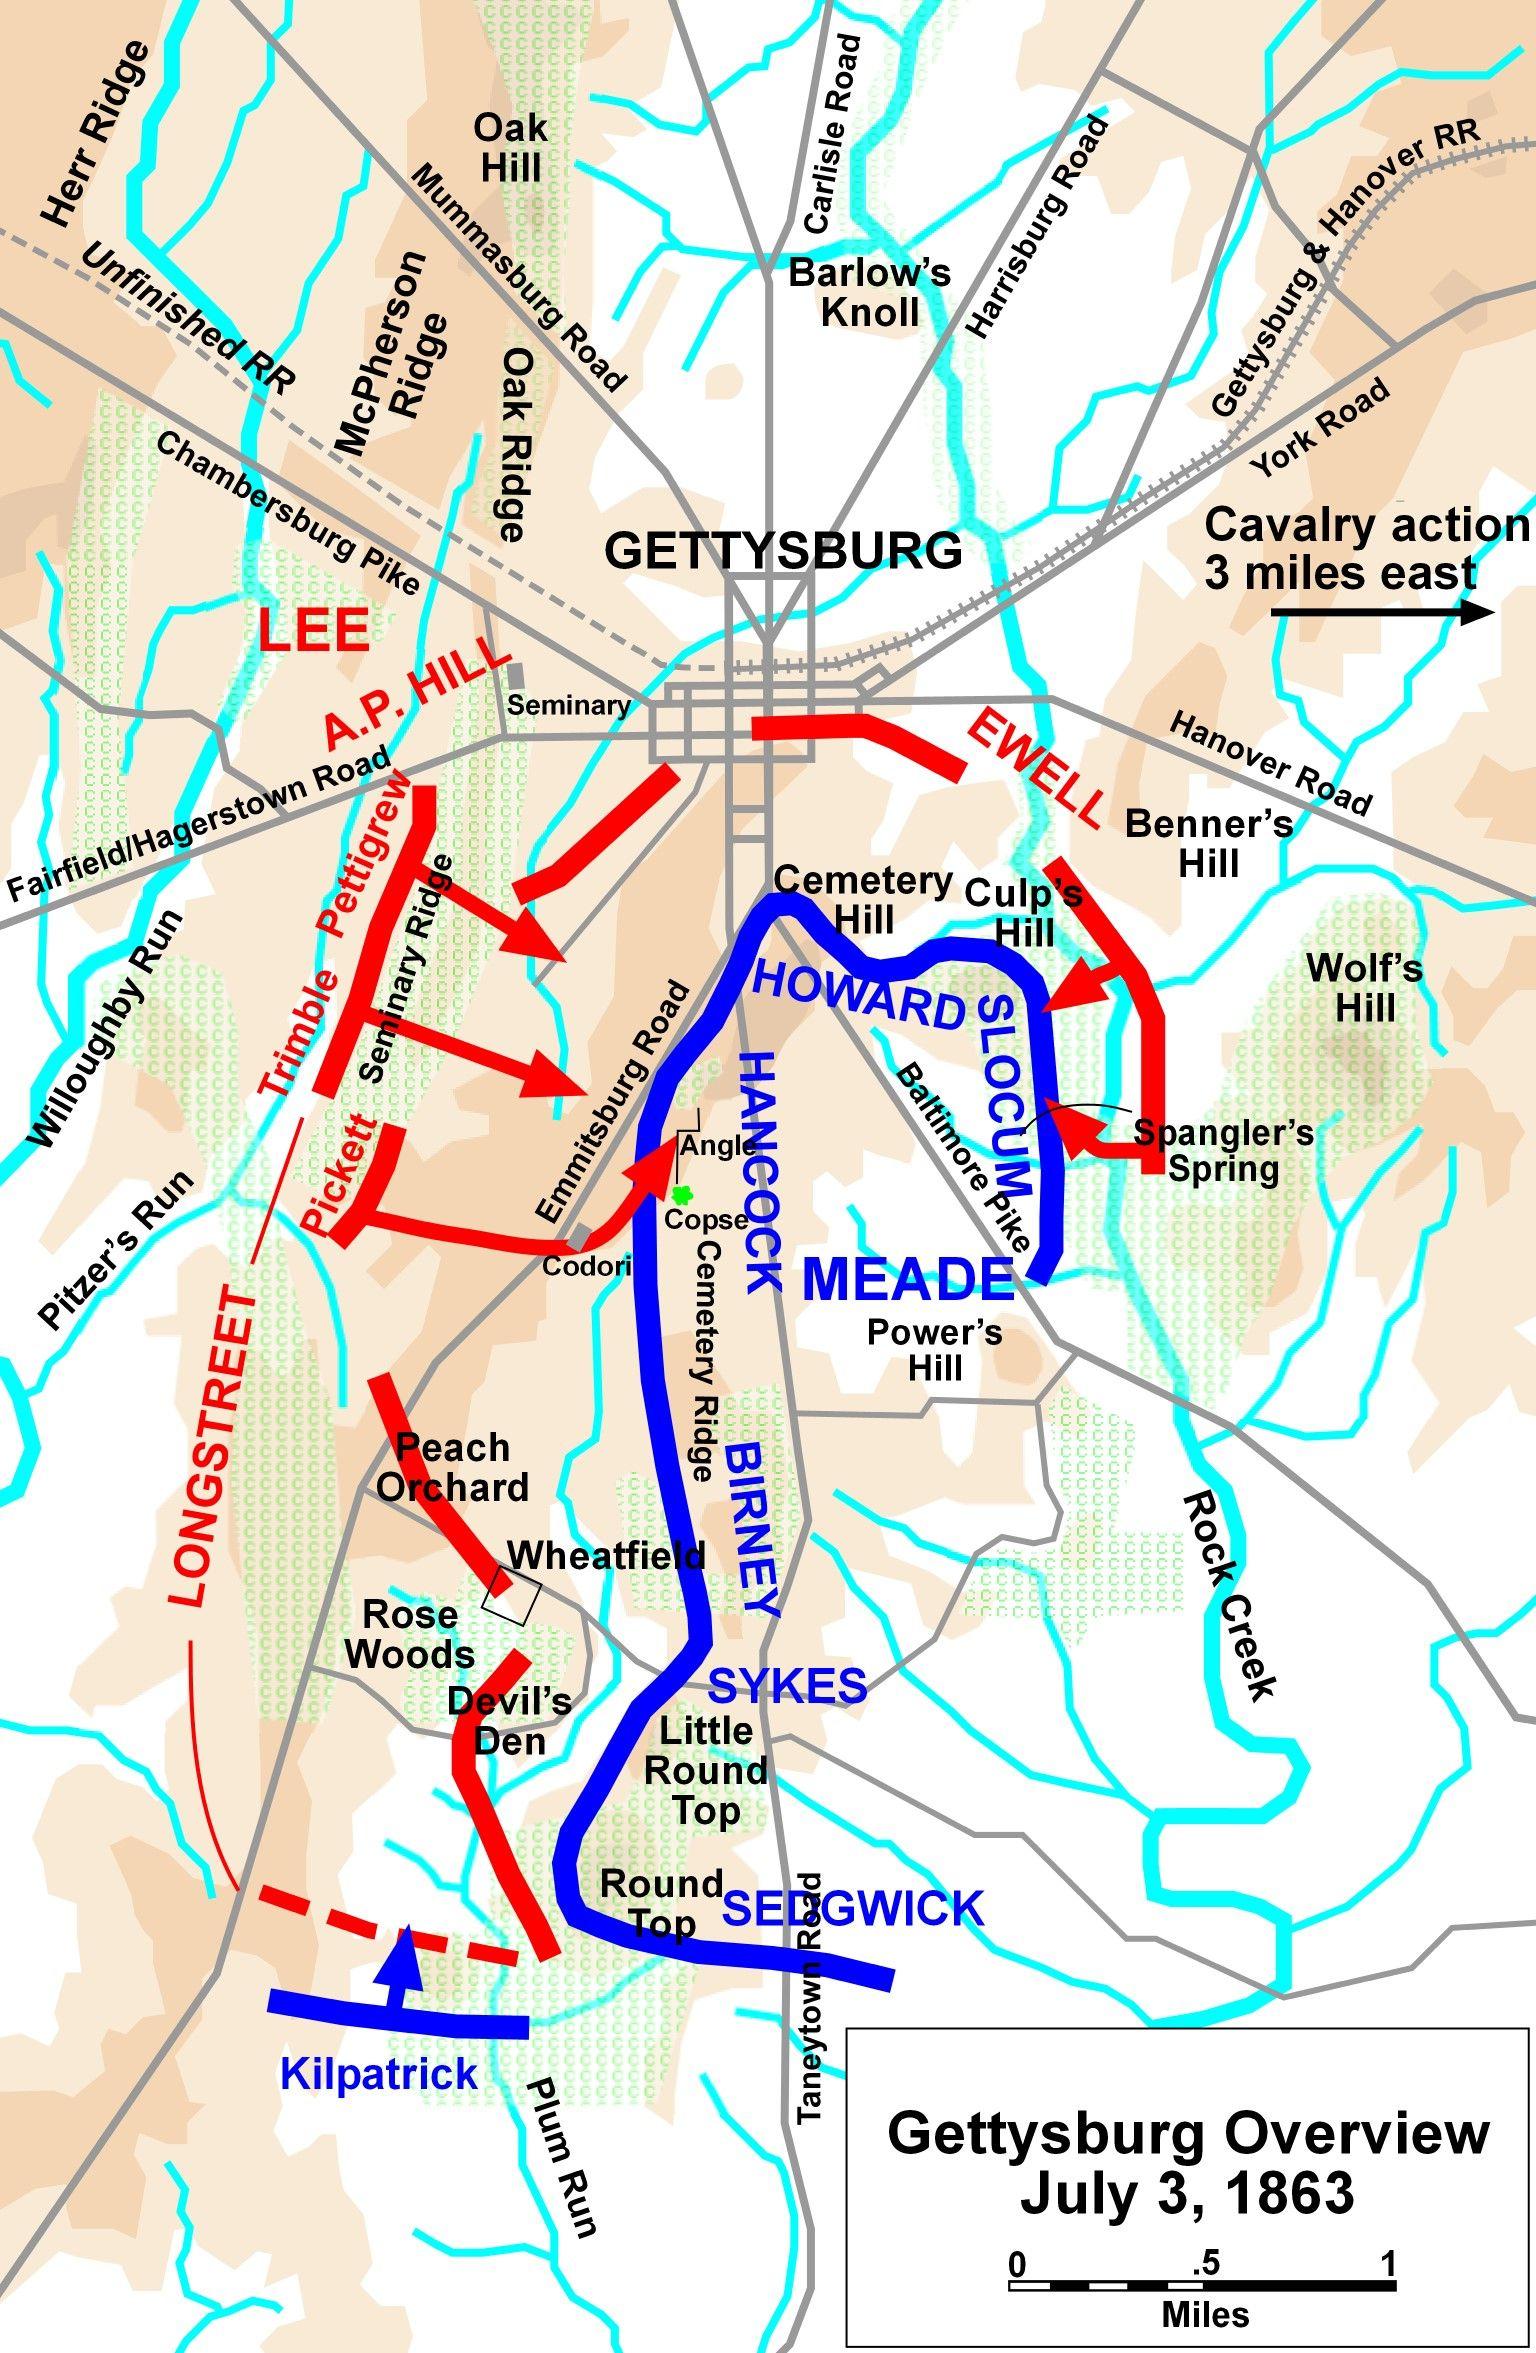 Gettysburg Battle Map Civil War Pinterest Gettysburg - Gettysburg on a map of the us